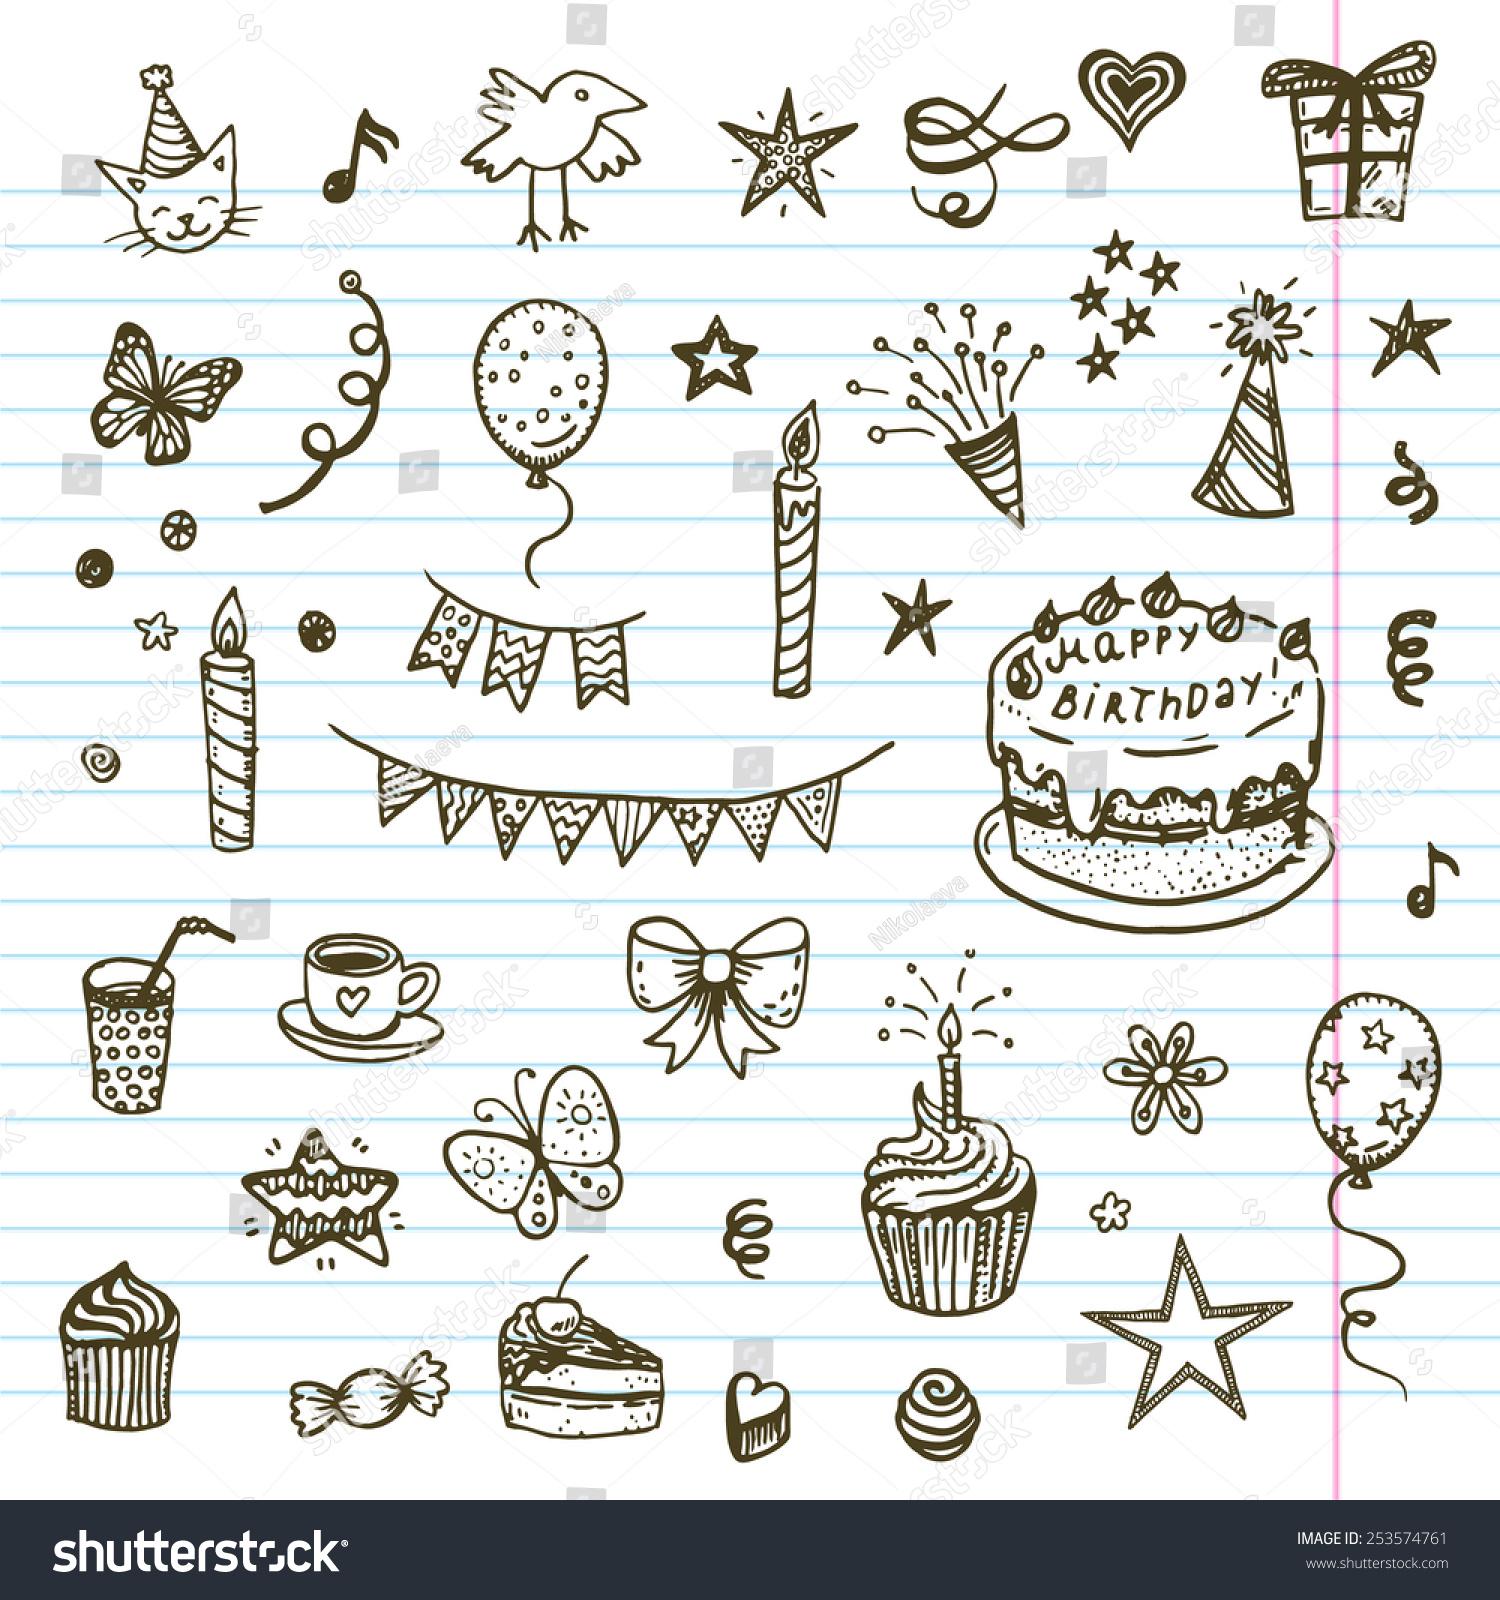 Birthday Elements Hand Drawn Set Birthday Stock Vector Royalty Free